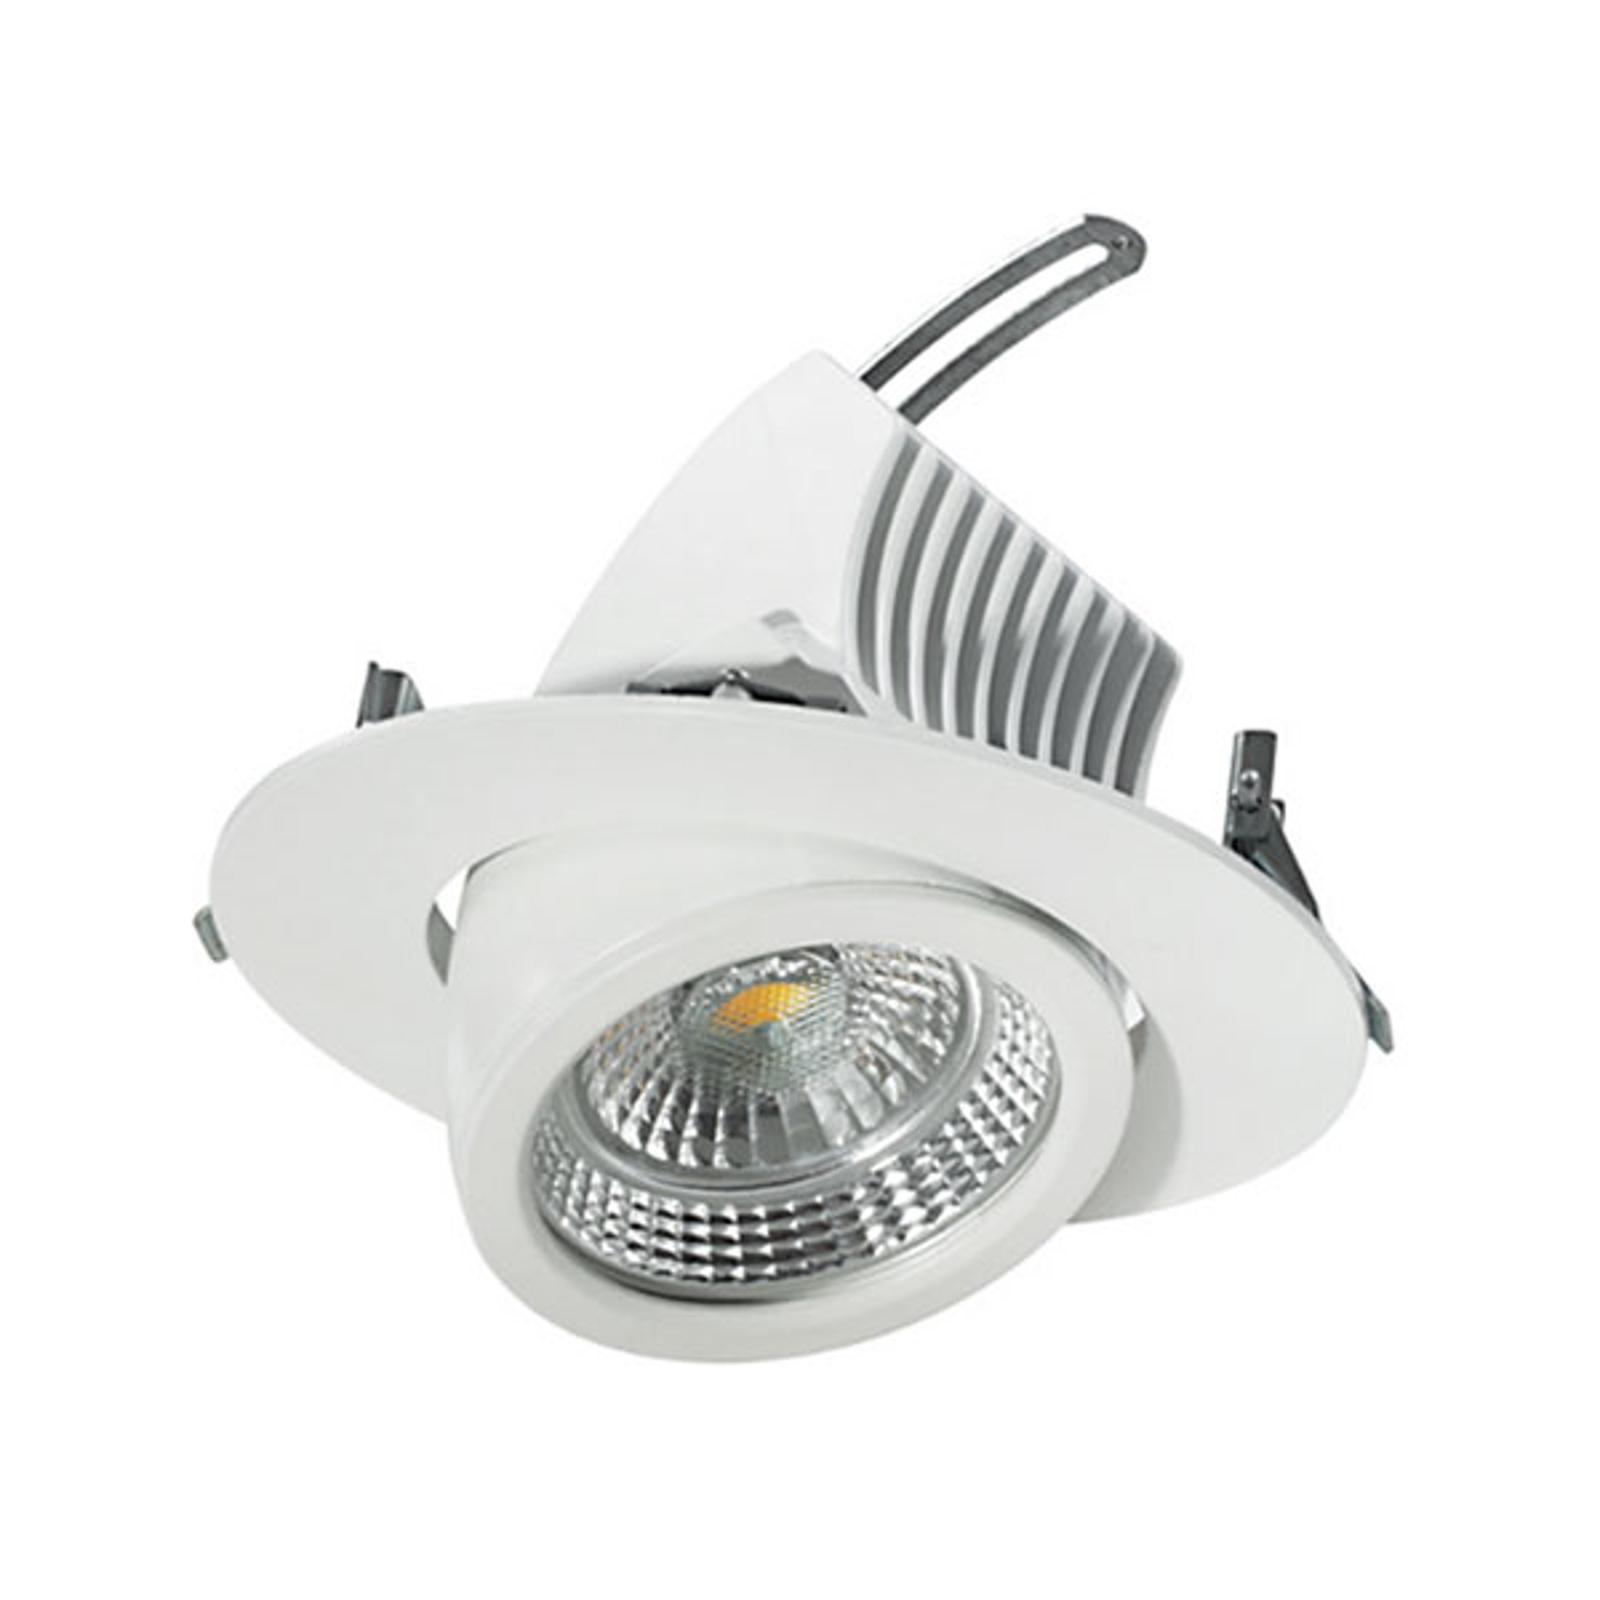 Draaibare LED inbouwspot 15 cm, 18 W